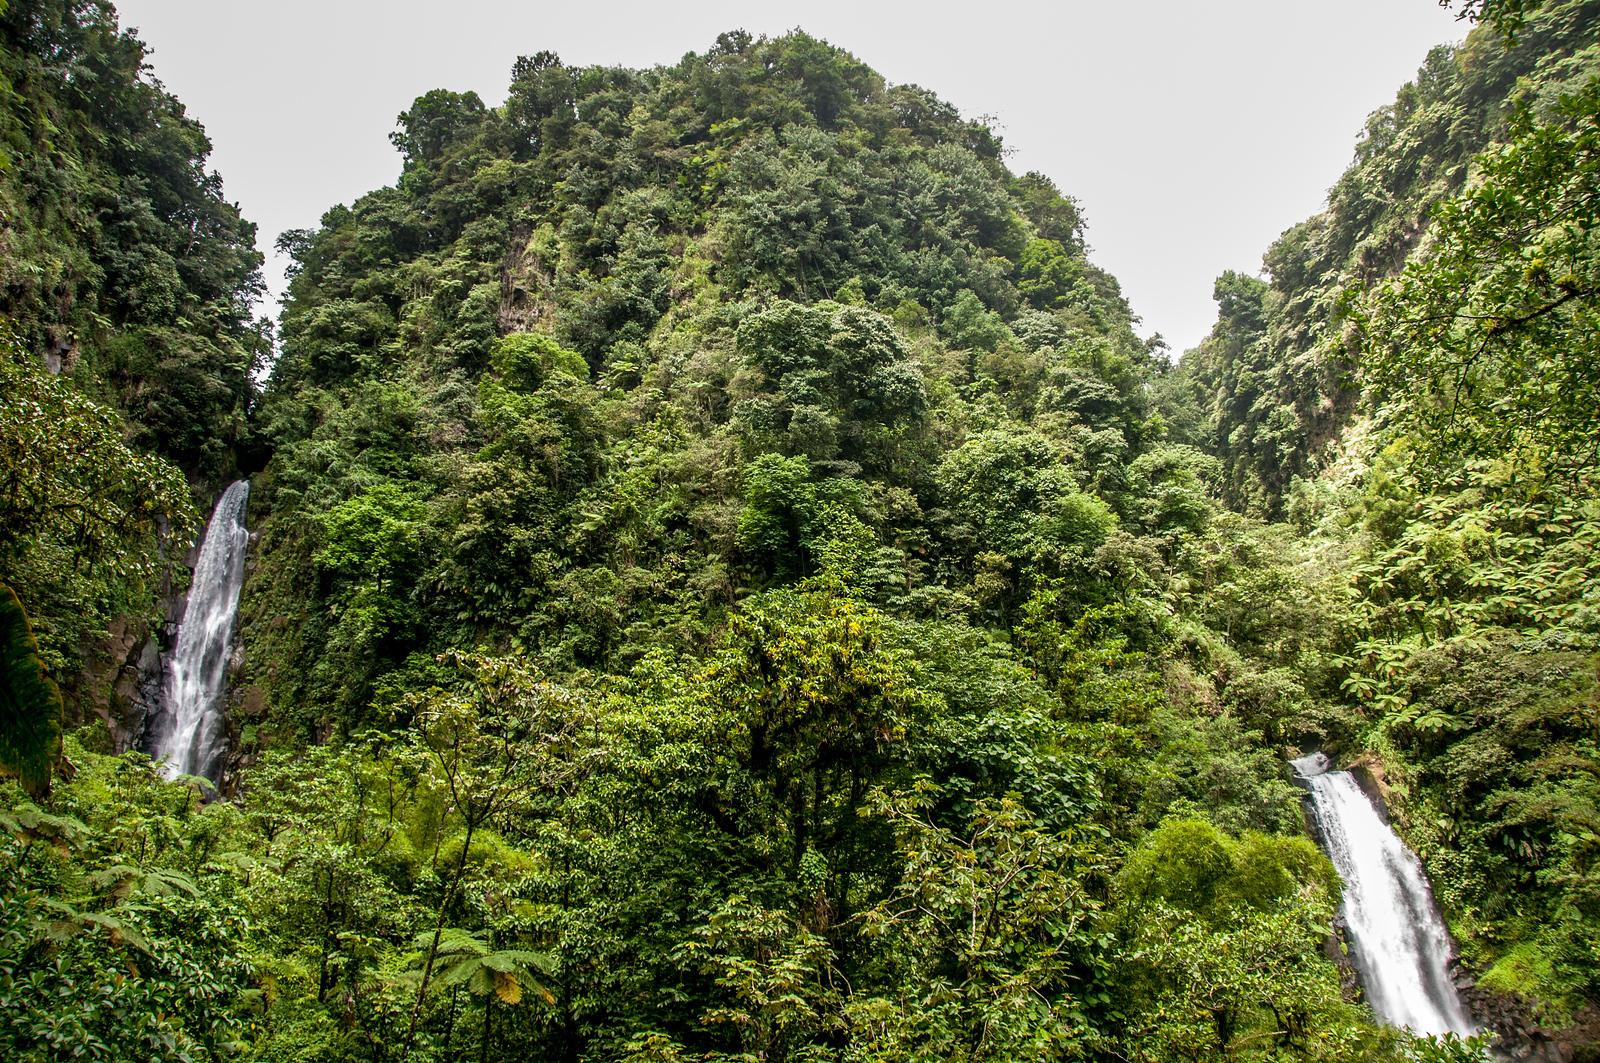 UNESCO World Heritage Site #252: Morne Trois Pitons National Park, Dominica